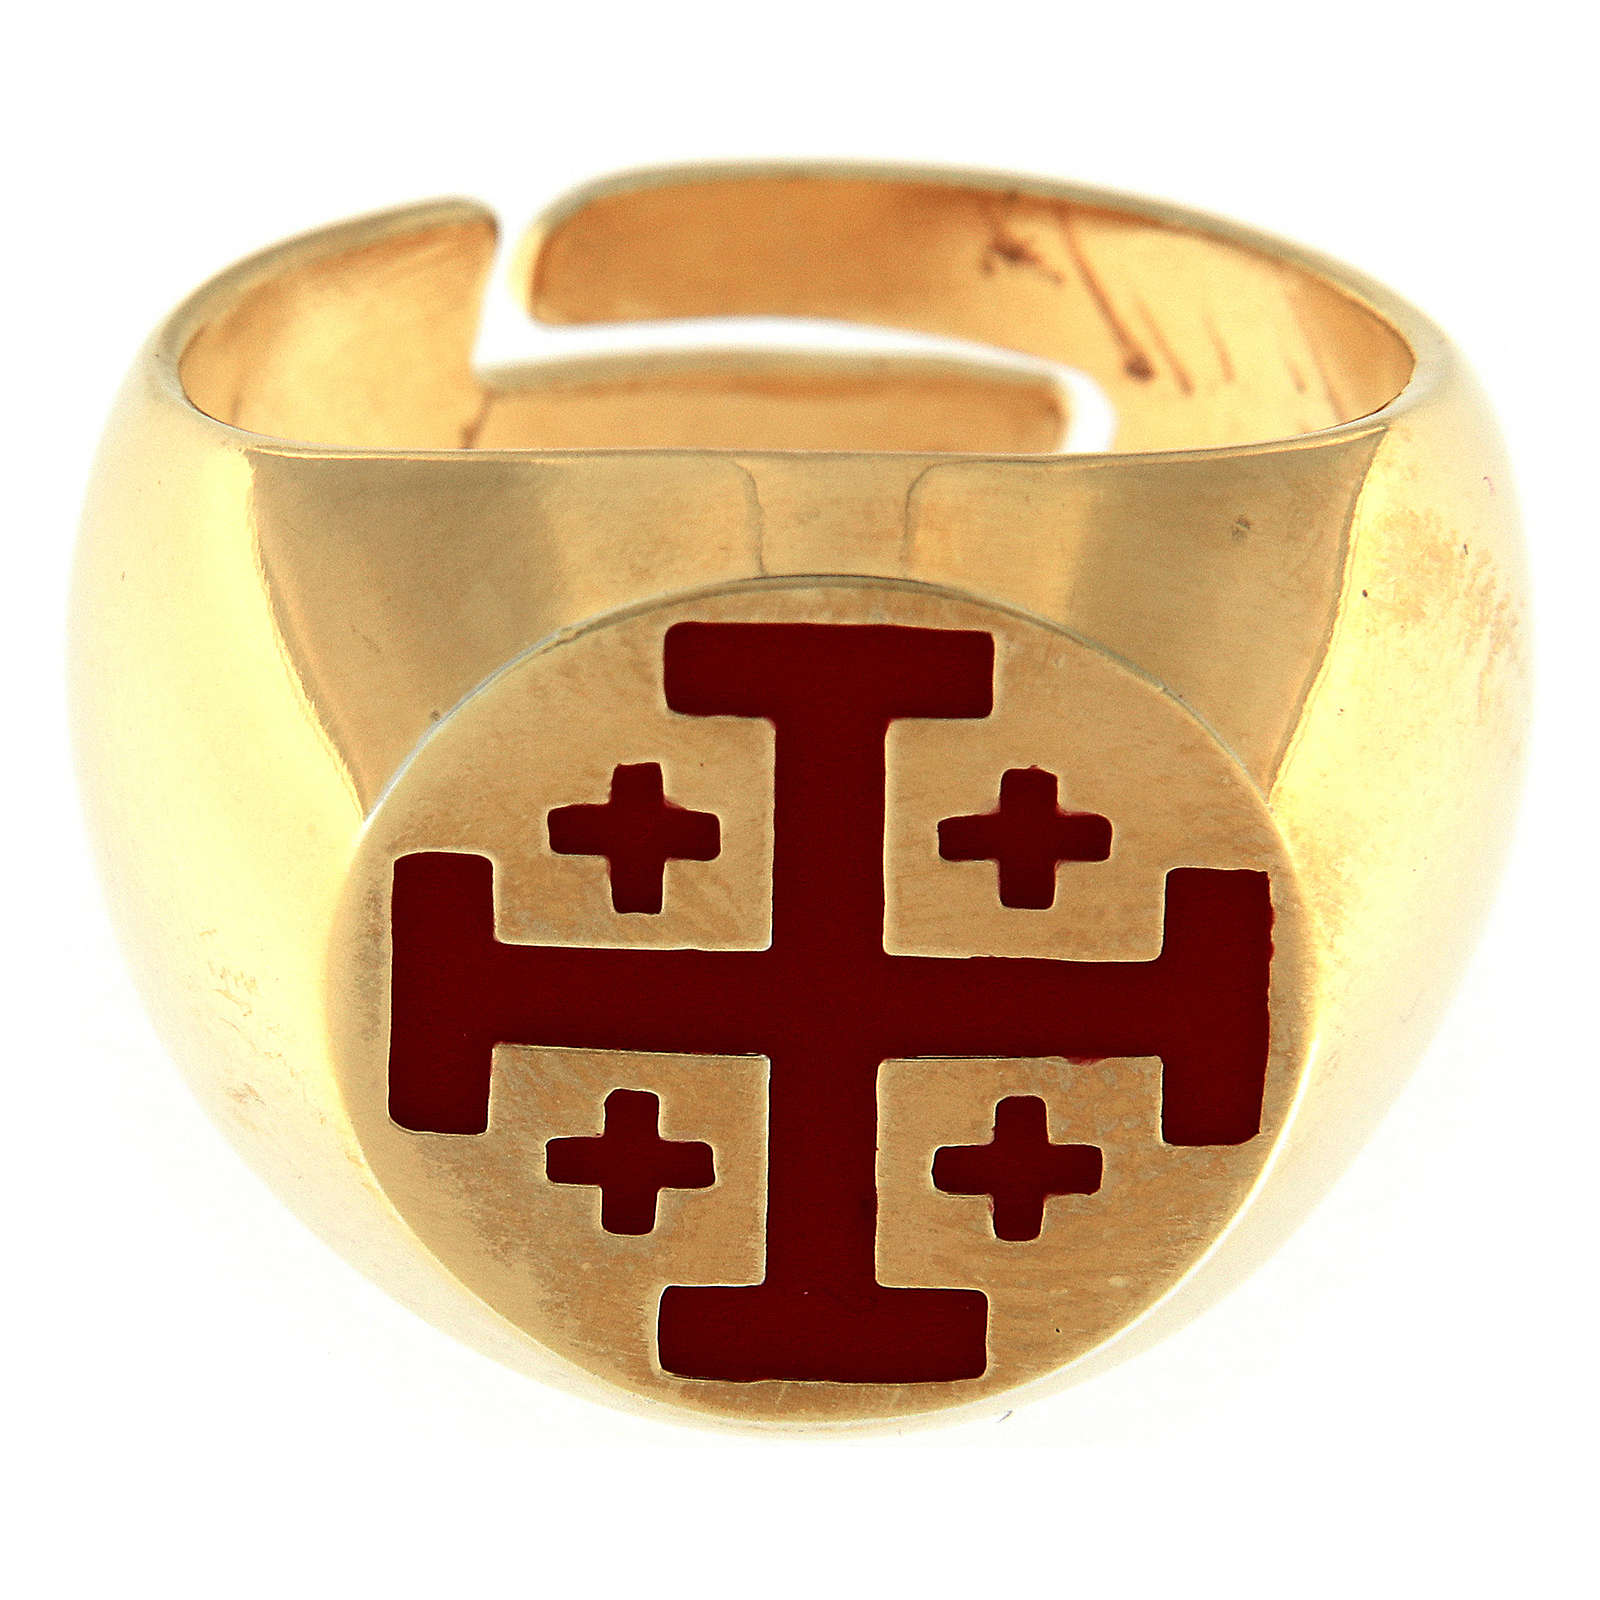 Bischofsring vergoldeten Silber 925 Jerusalem Kreuz 3